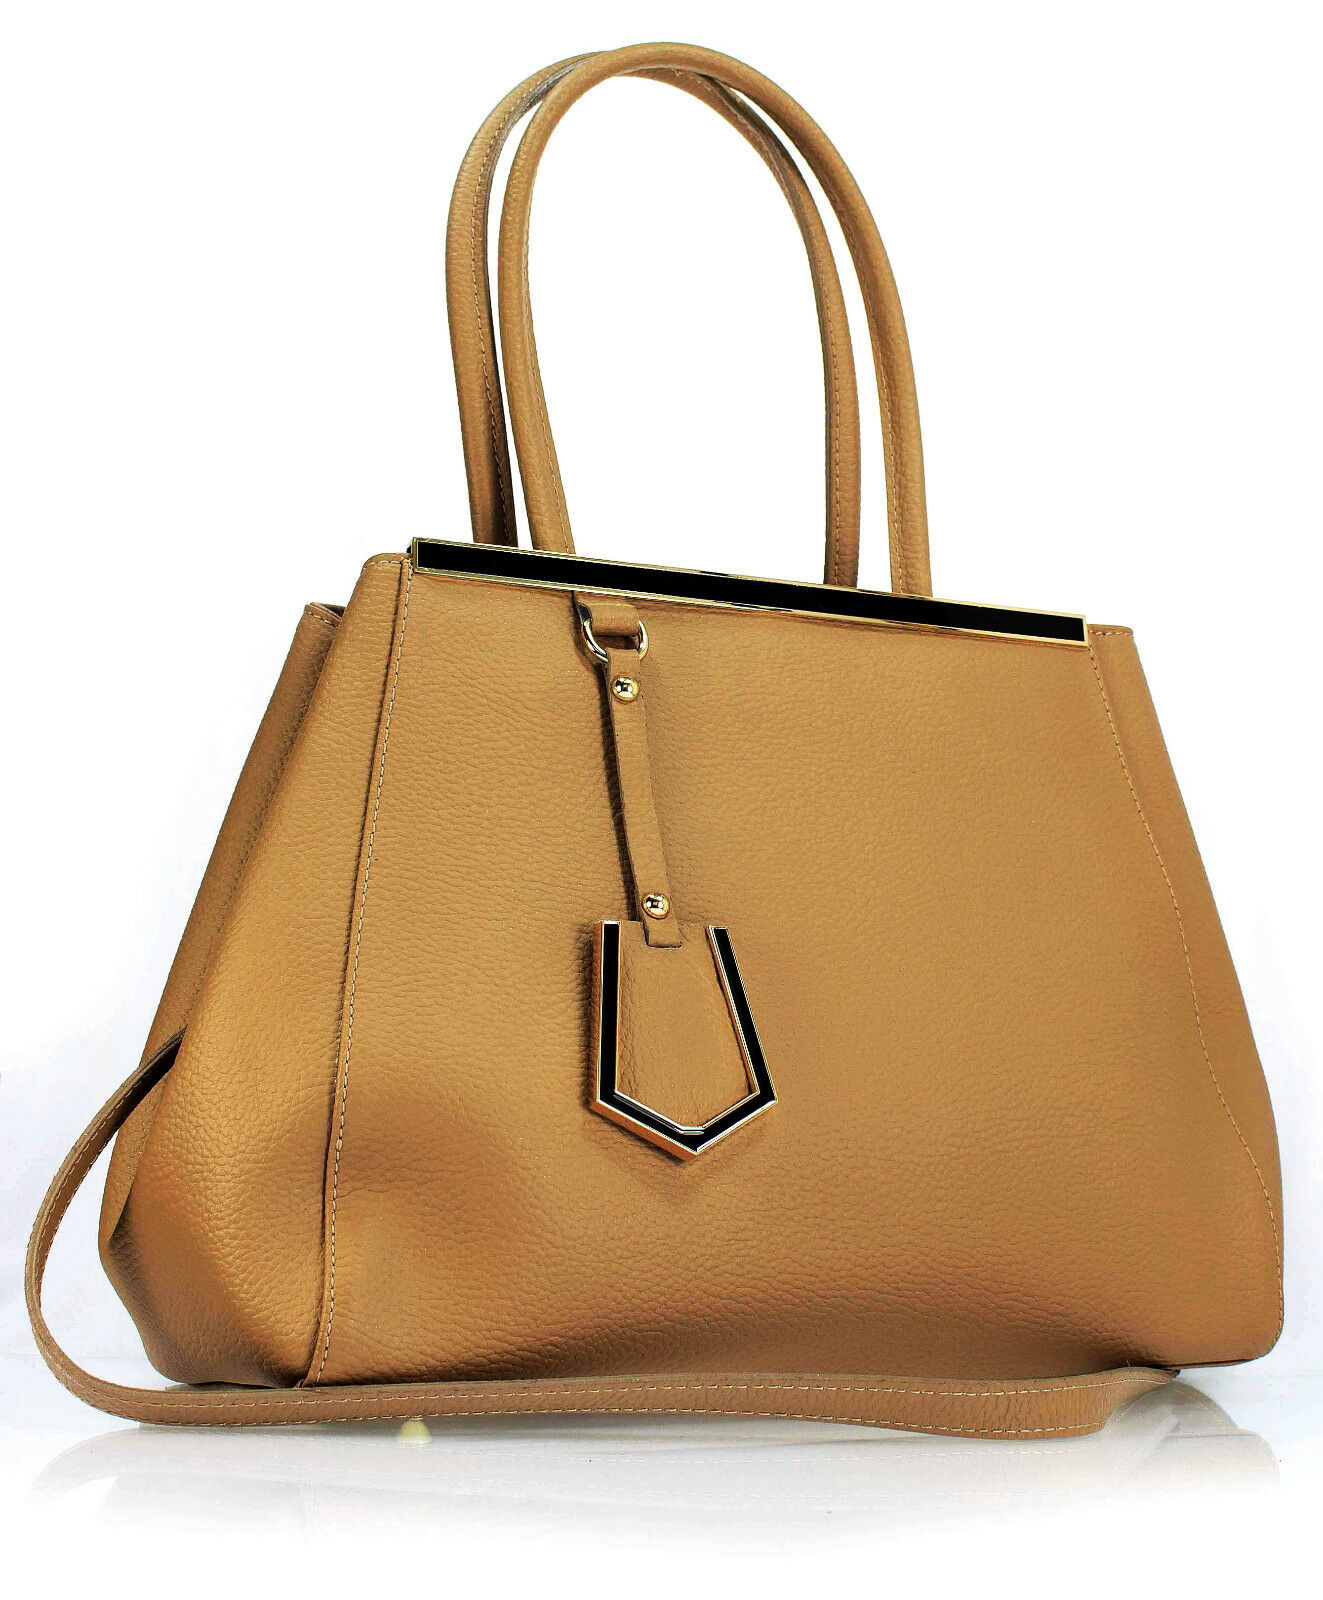 Ital. Echt Echt Echt Leder Damen Tasche Ledertasche Handtasche Schultertasche taupe   Perfekt In Verarbeitung    Sonderangebot    Bunt,  6d1503